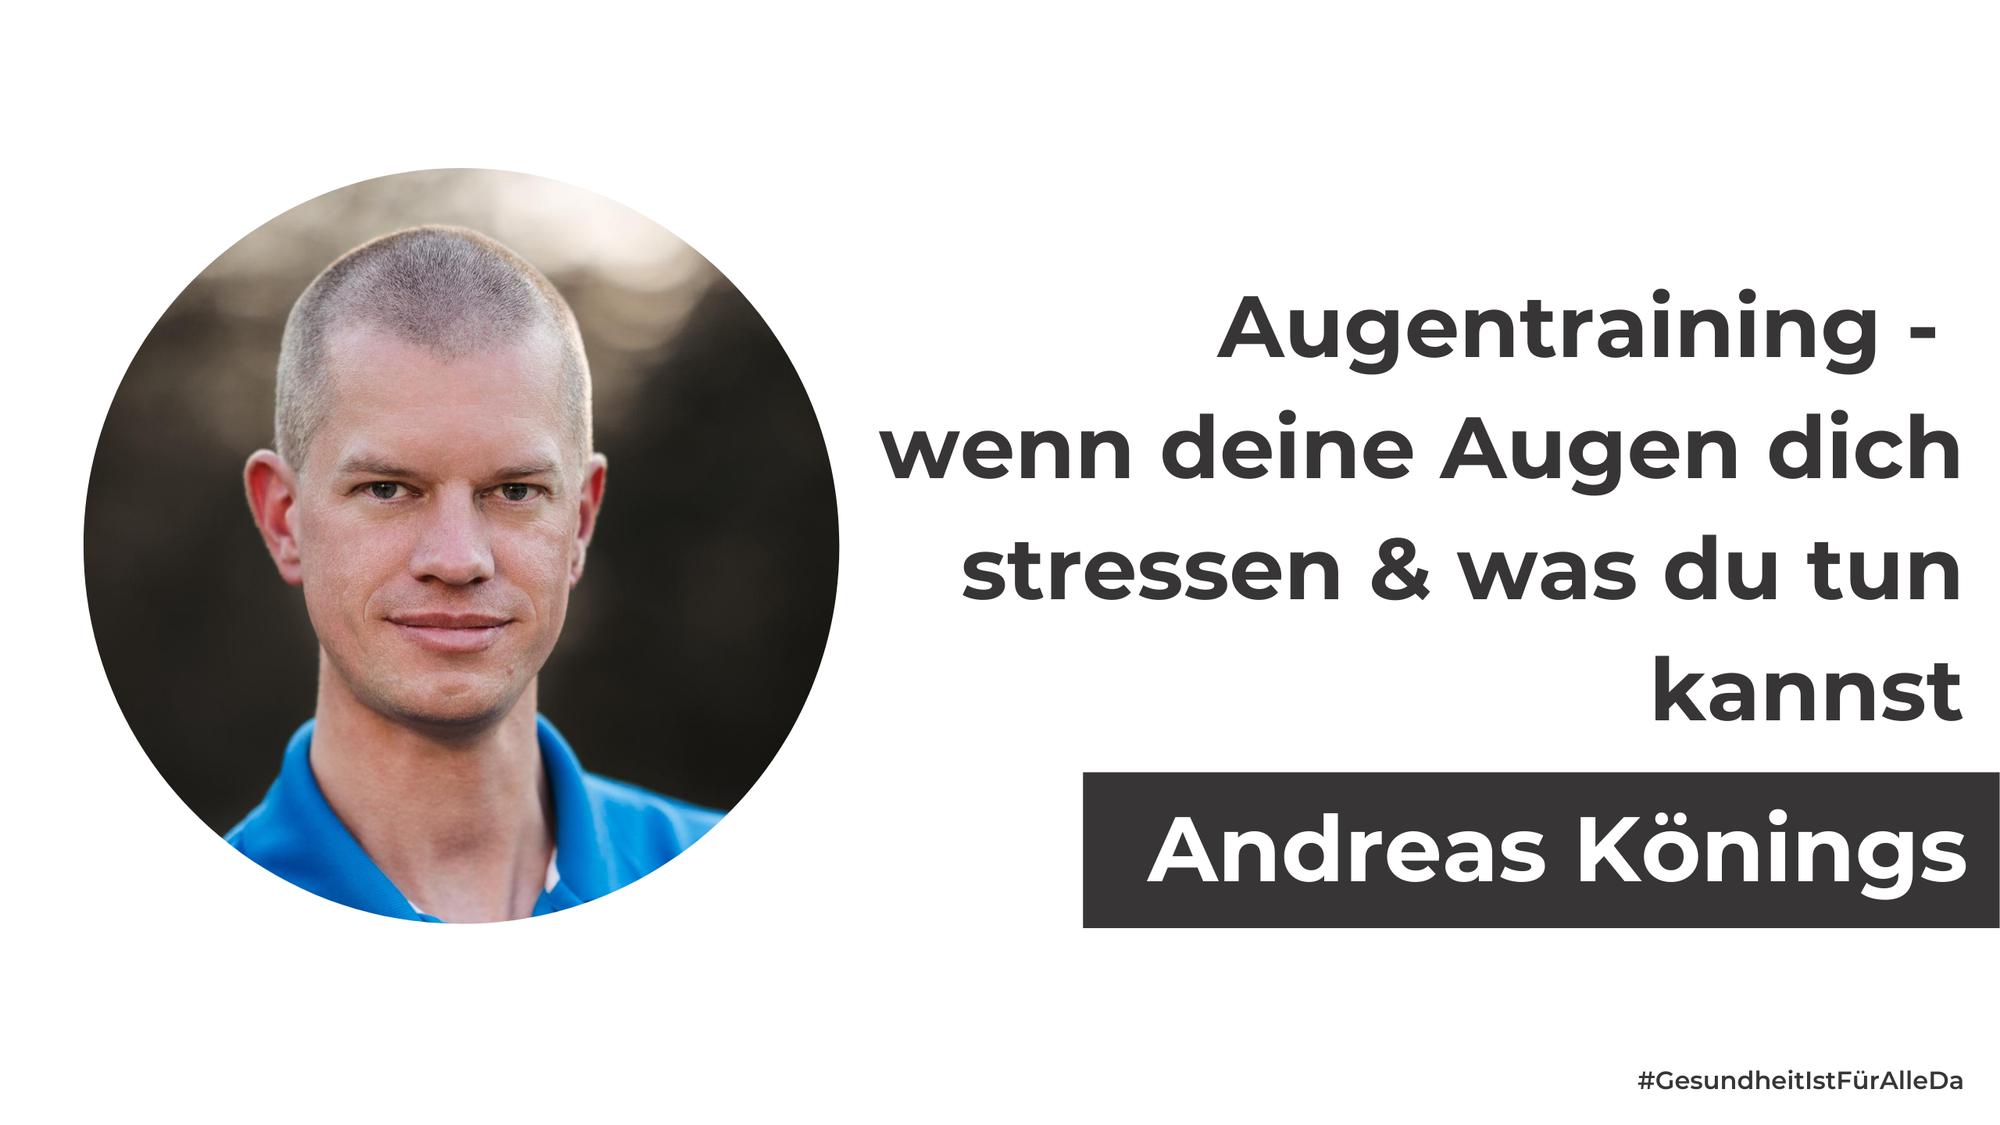 Andreas Könings